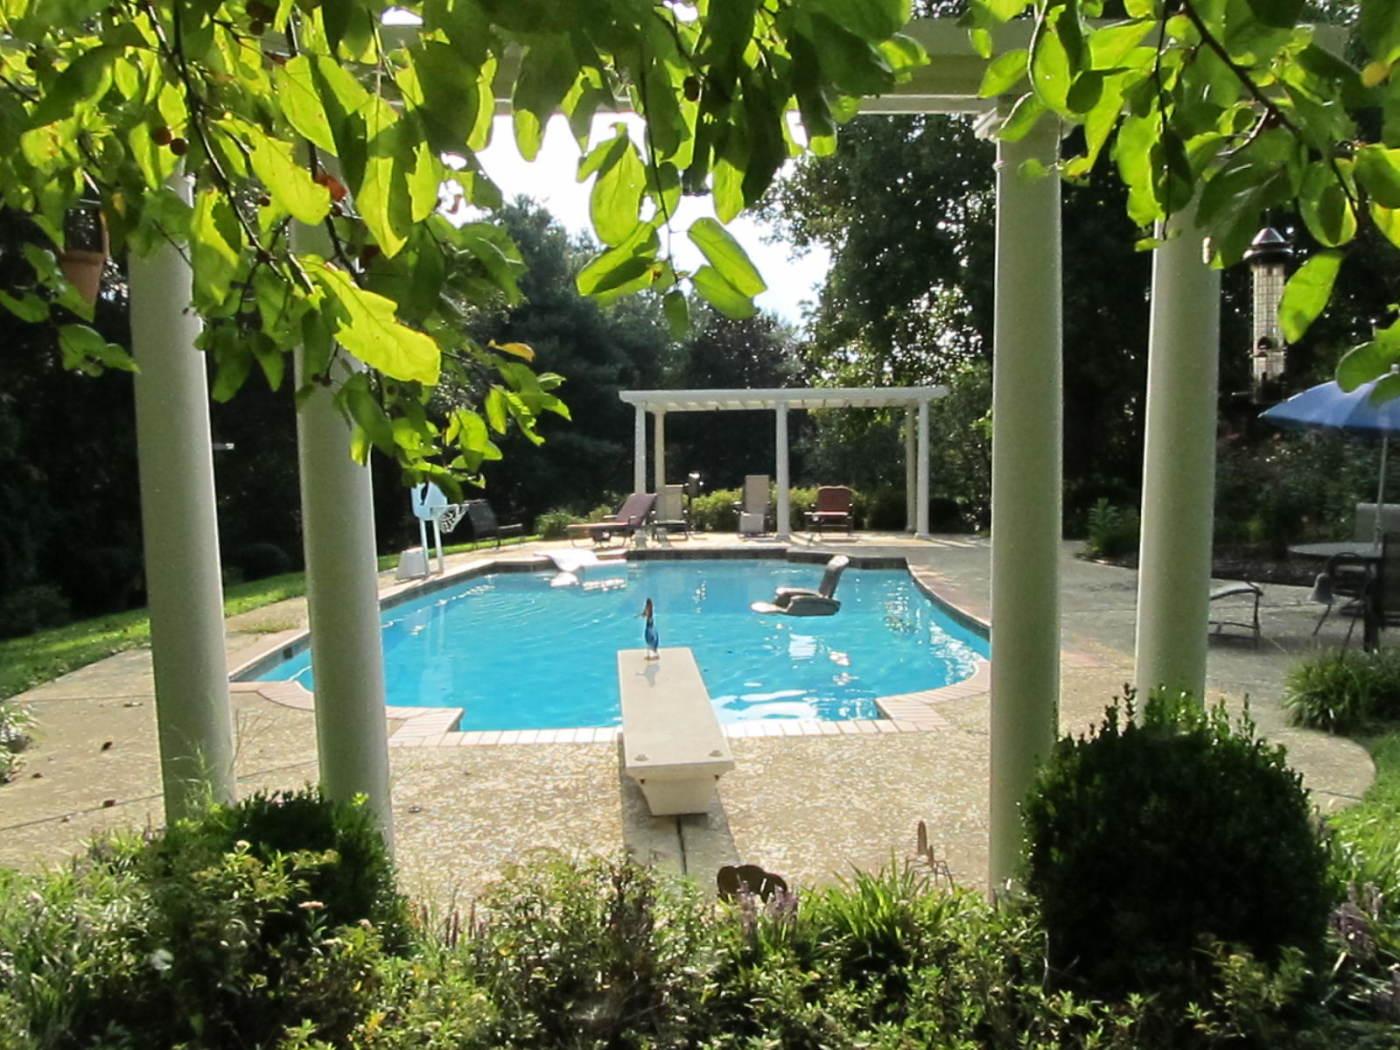 Levitt Pool and Arbors